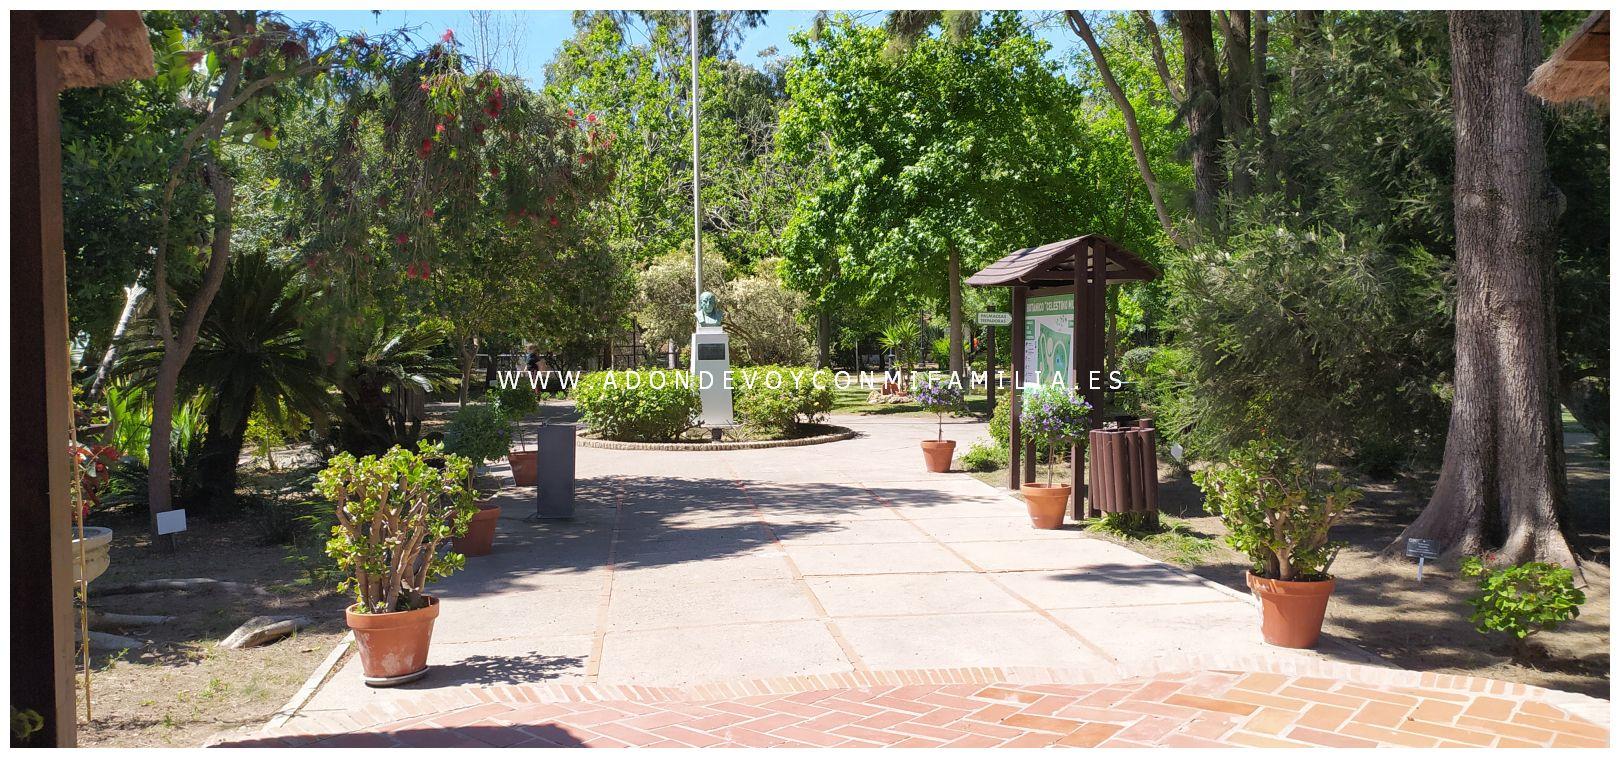 jardin botanico celestino muits rota adondevoyconmifamilia 04